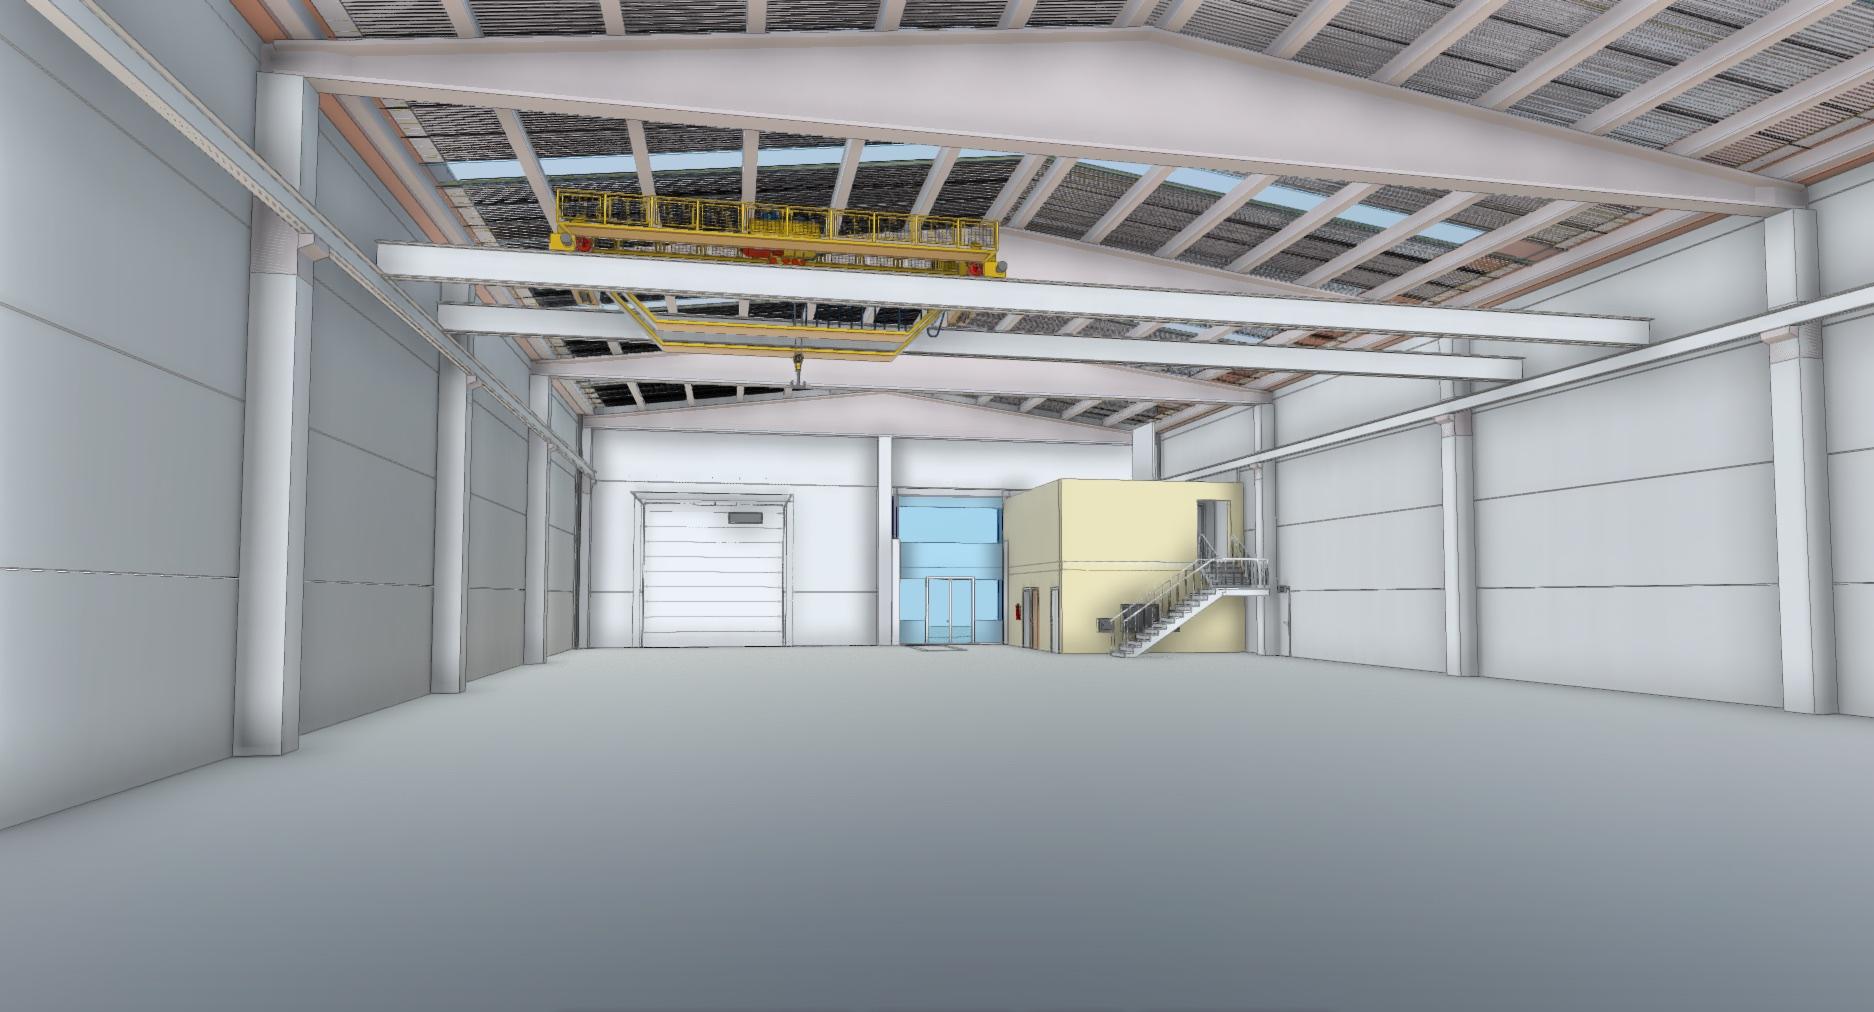 nave chorreados rubi interior 2